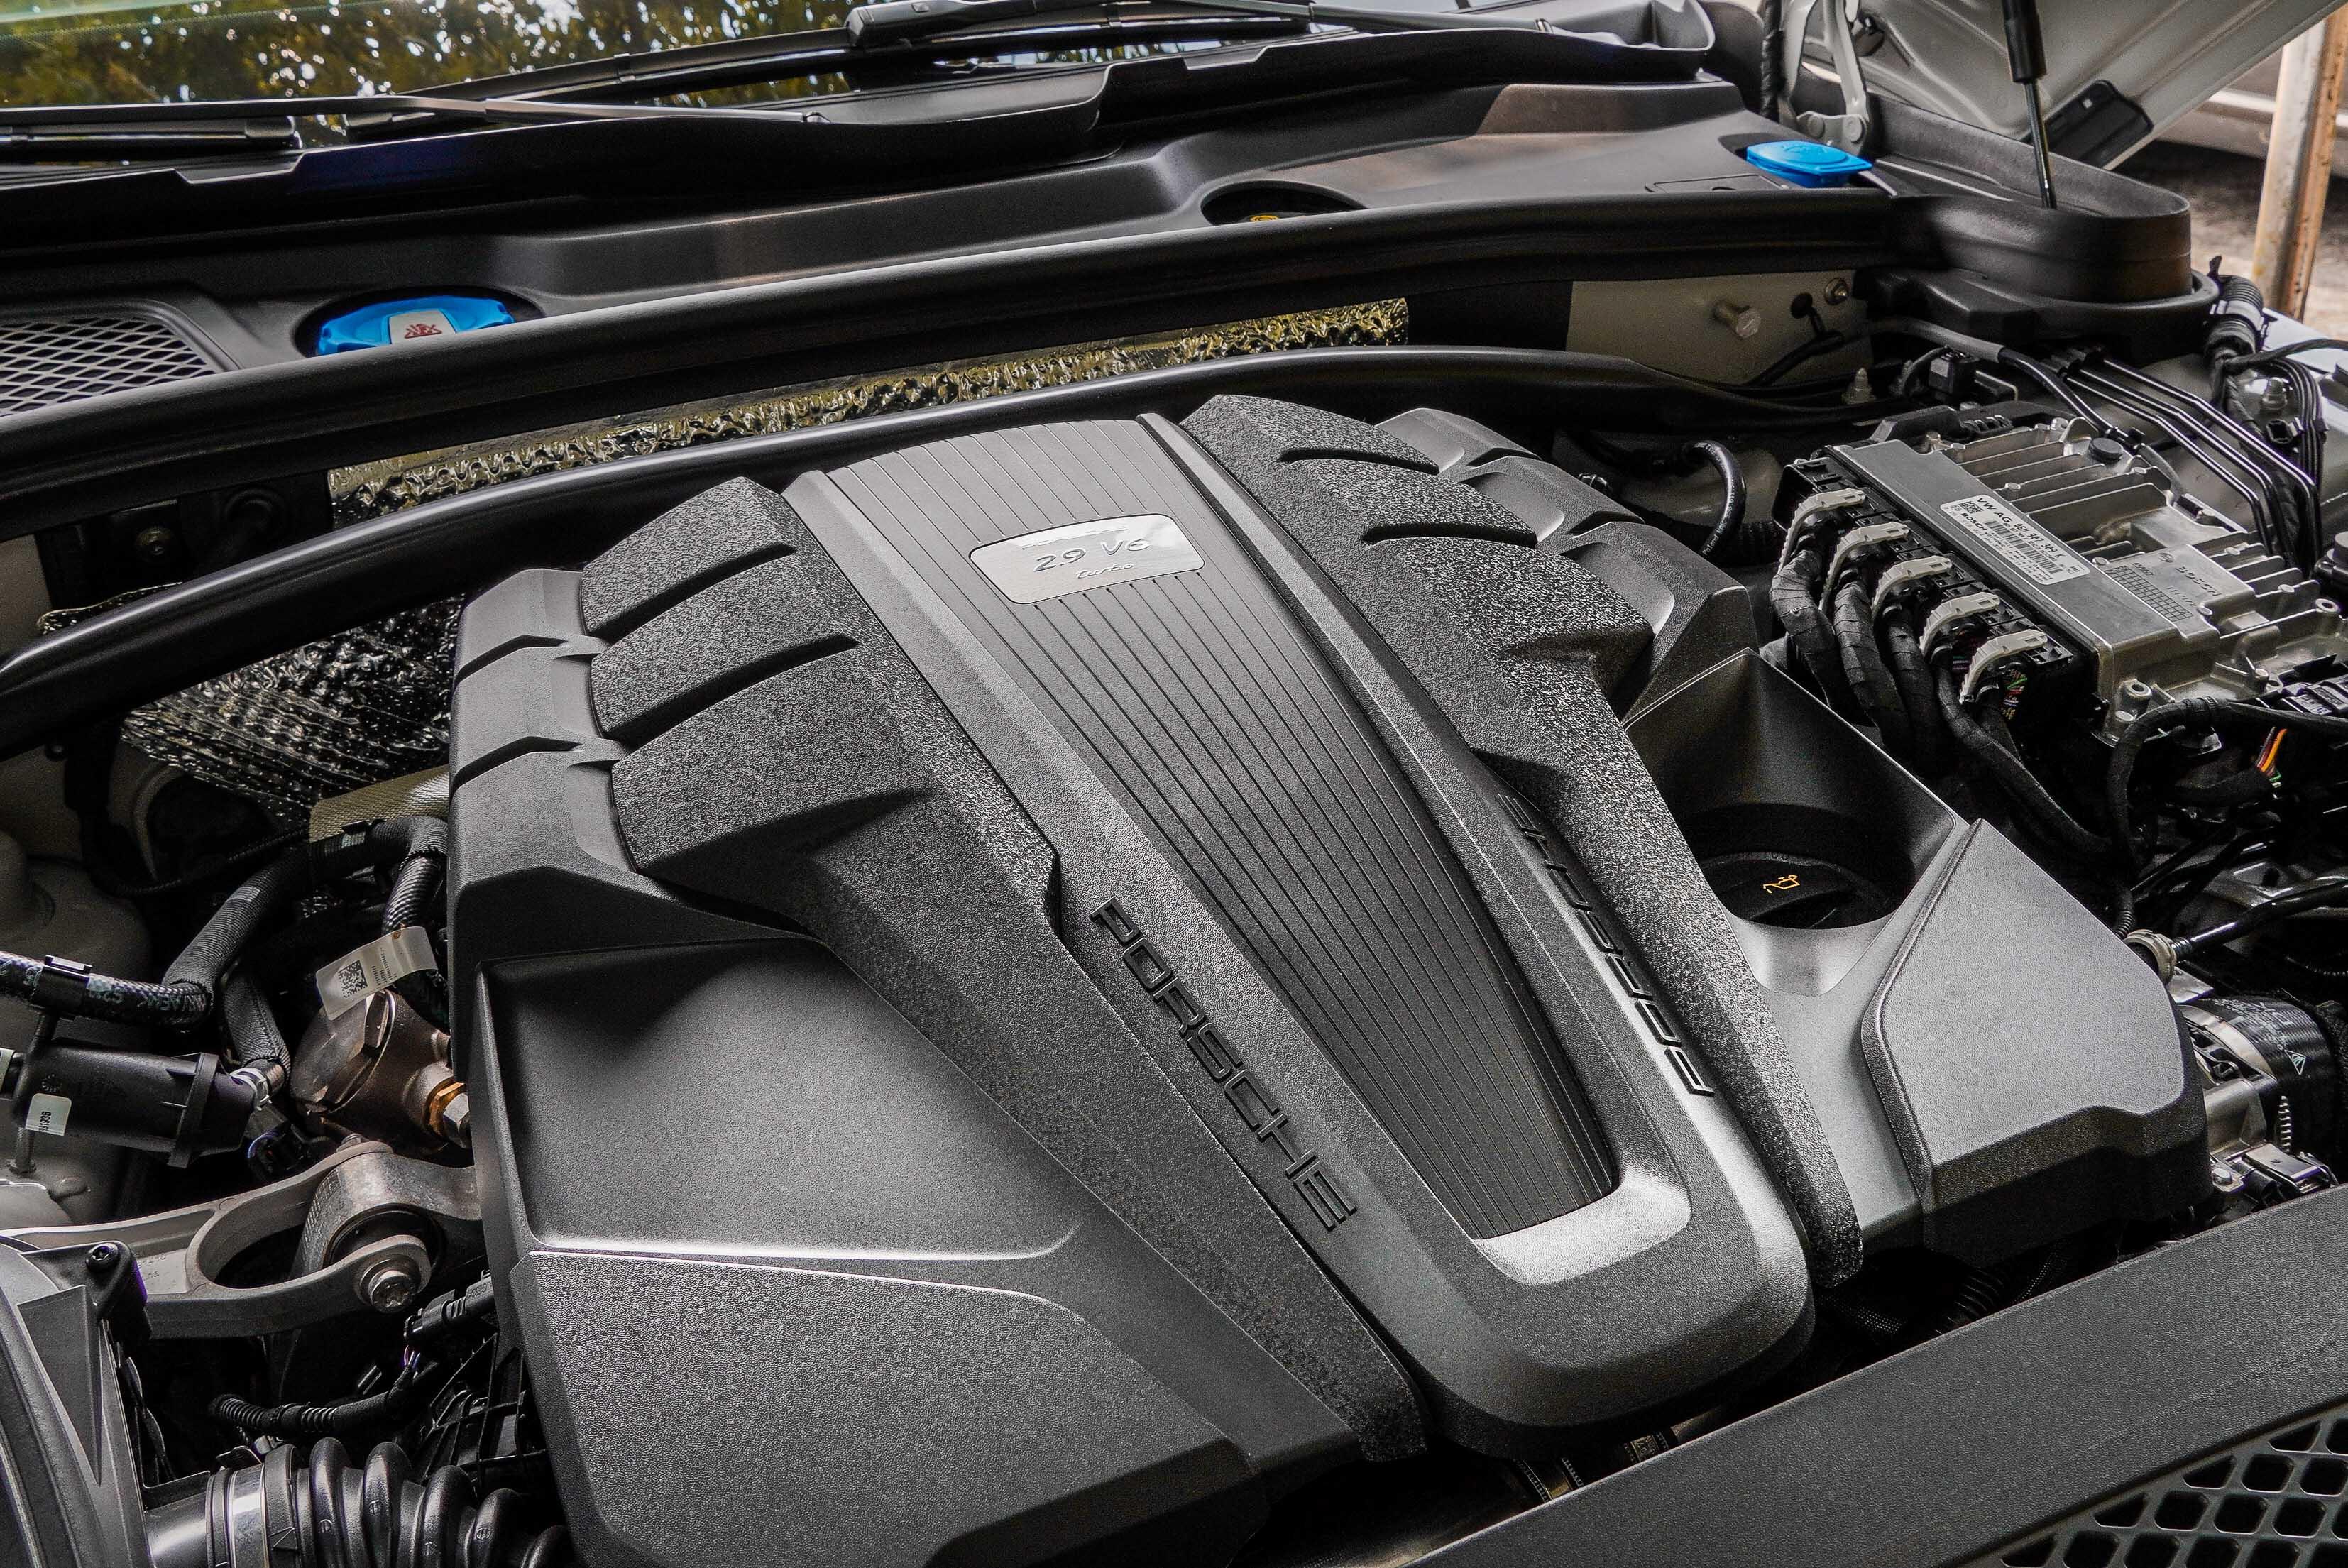 V6 雙渦輪增壓引擎創造 440 PS、550 Nm 的動力輸出,基本能夠在 4.5 秒內完成 0-100 km/h 加速。